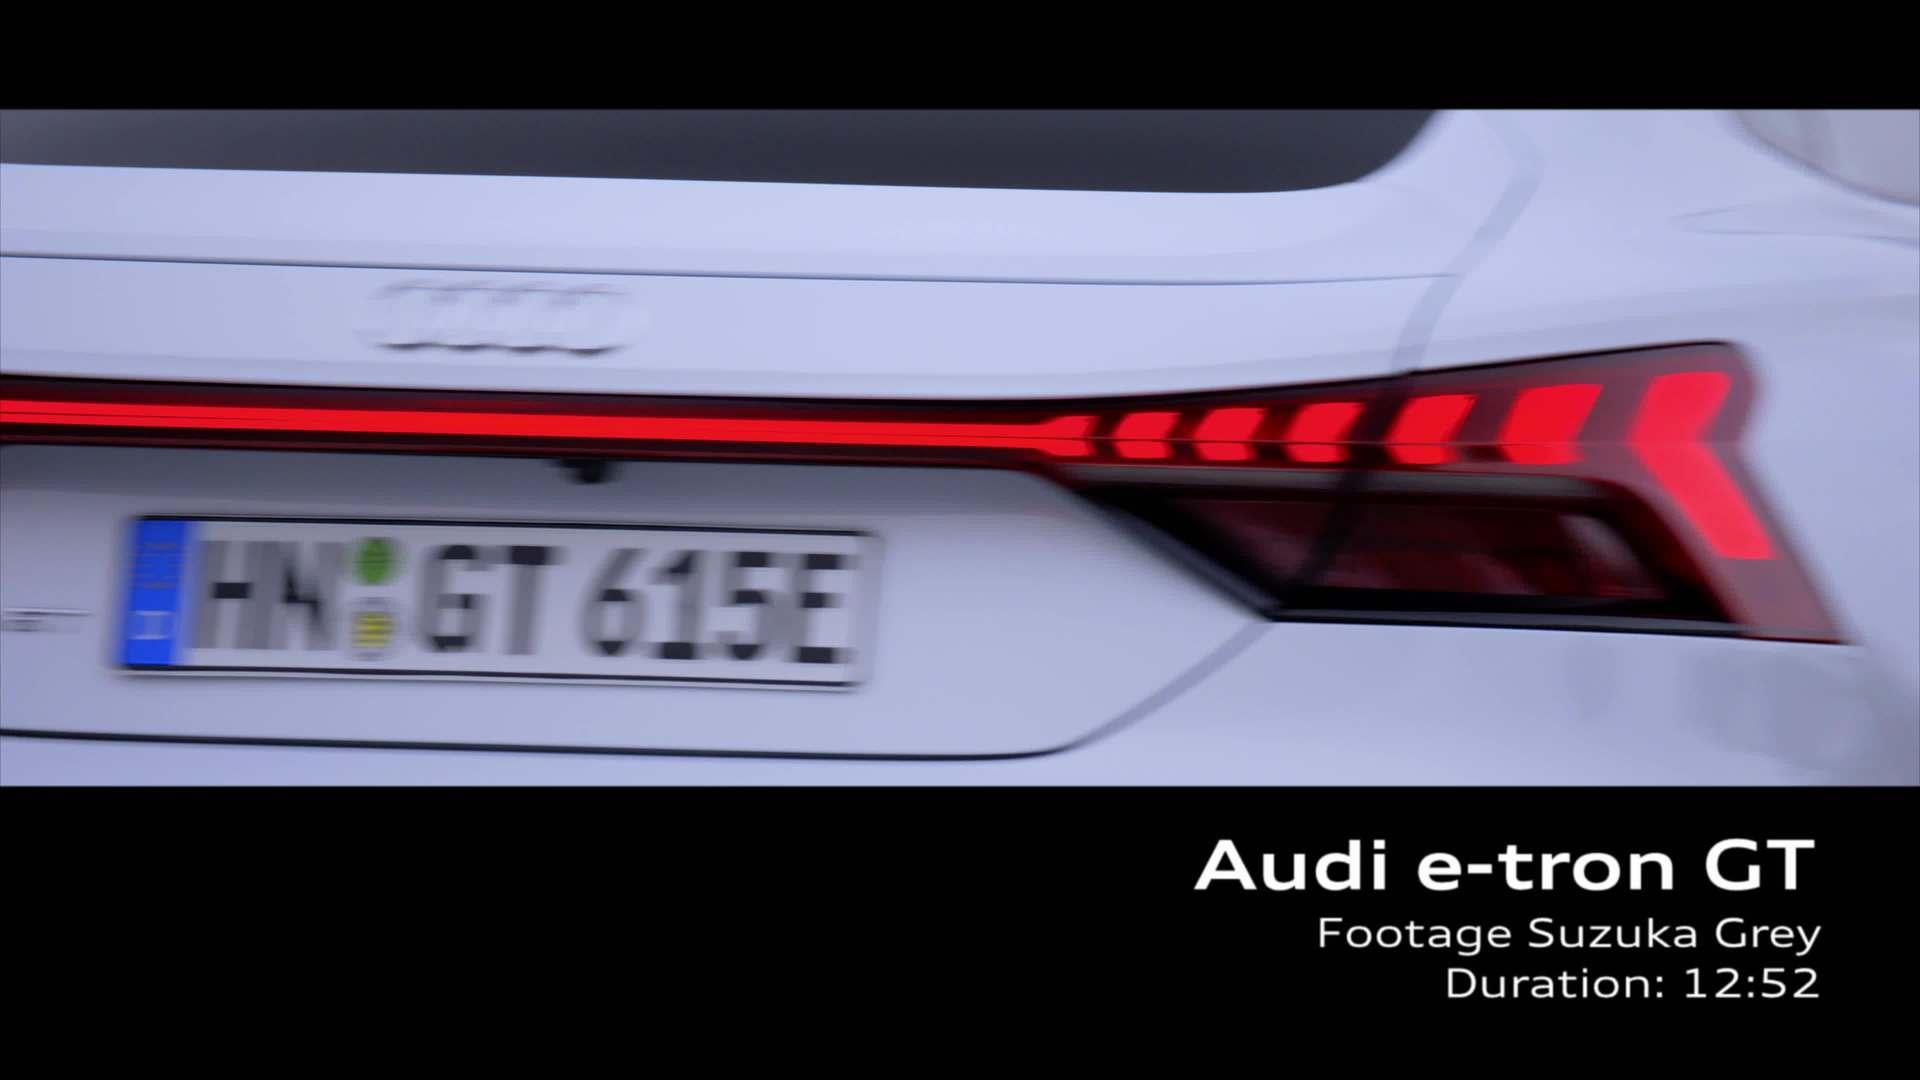 Footage: Audi e-tron GT Suzukagrau